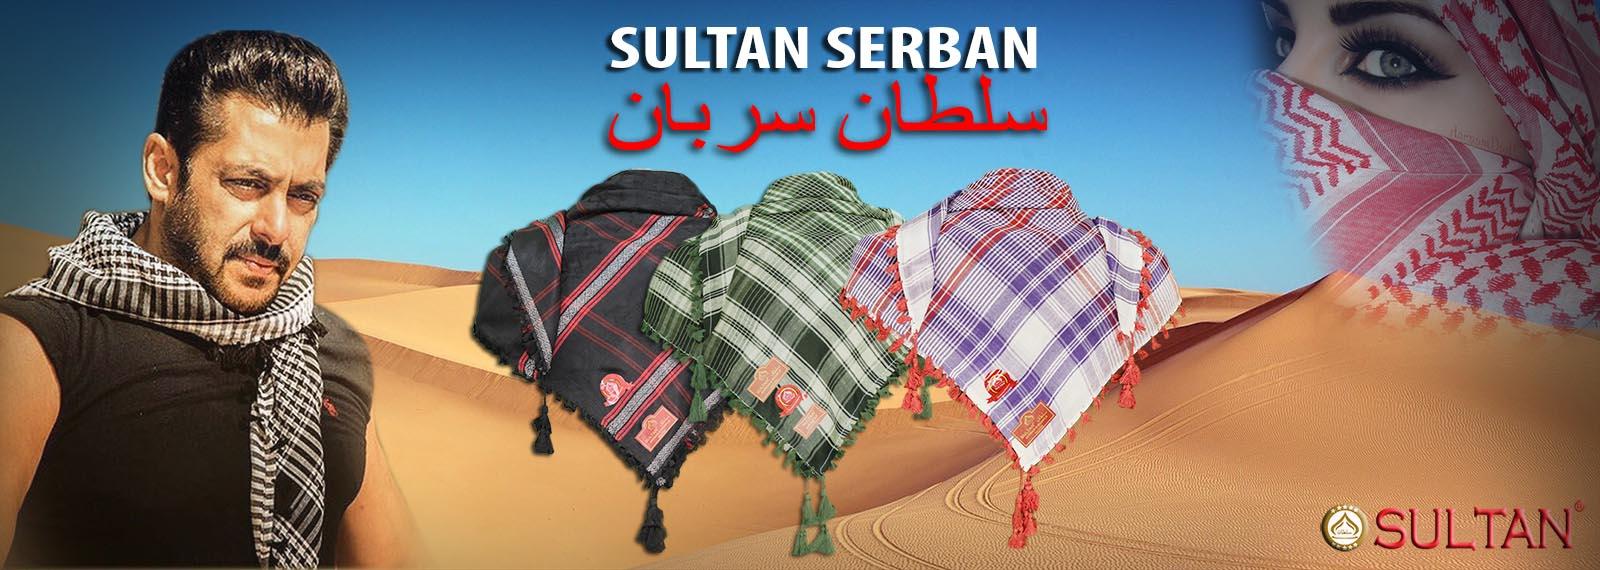 Sultan2